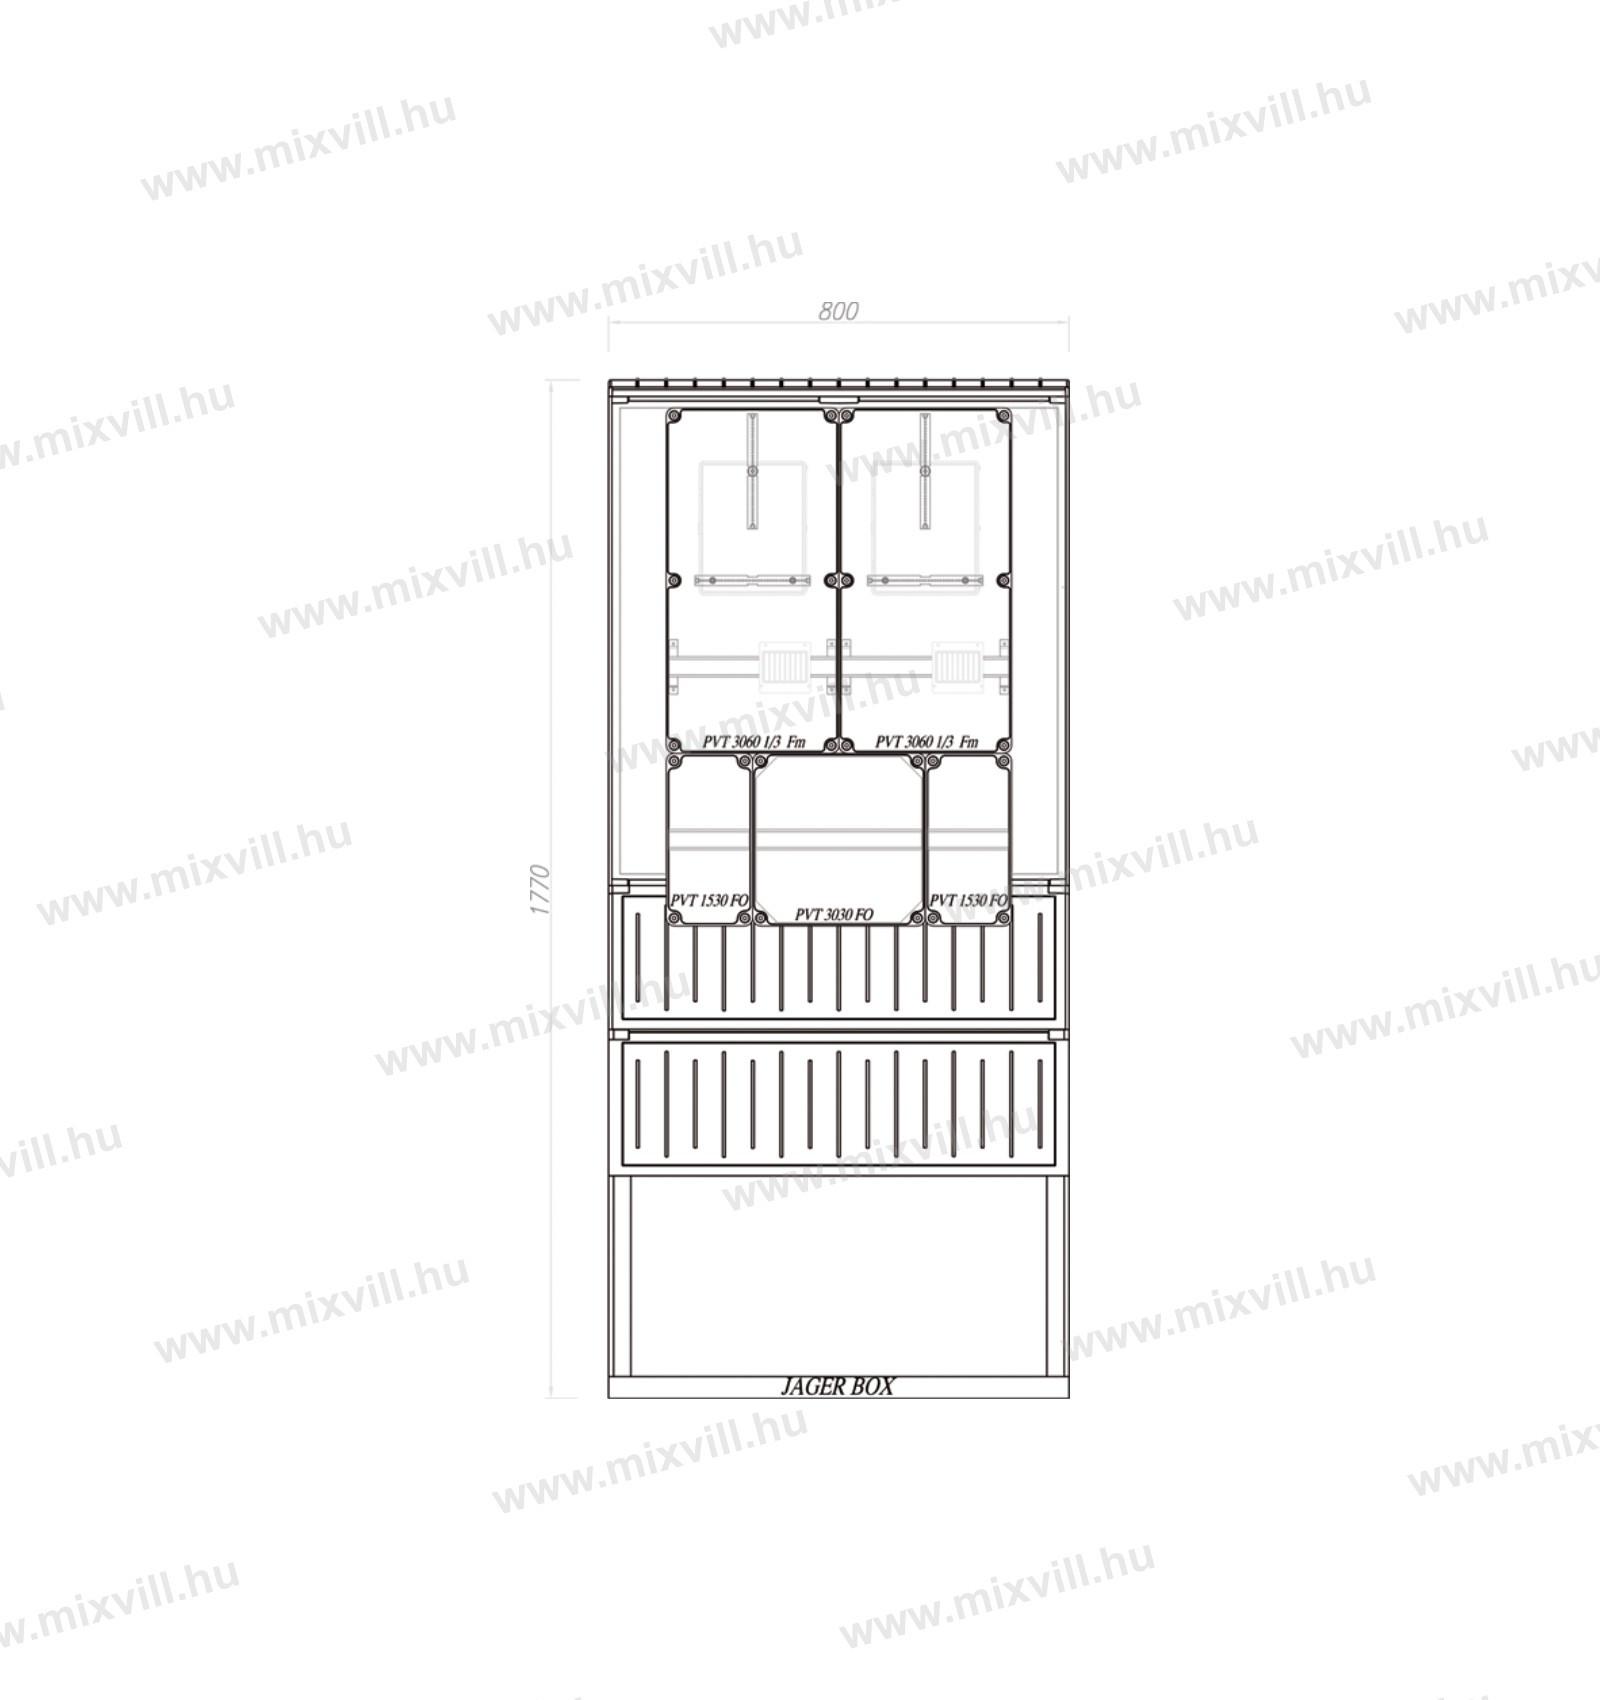 CSPEA-72000013-pvt-k-l-eon-2x3-fm-am-labazati-szekreny-foldbe-telepitheto-haromfazisu